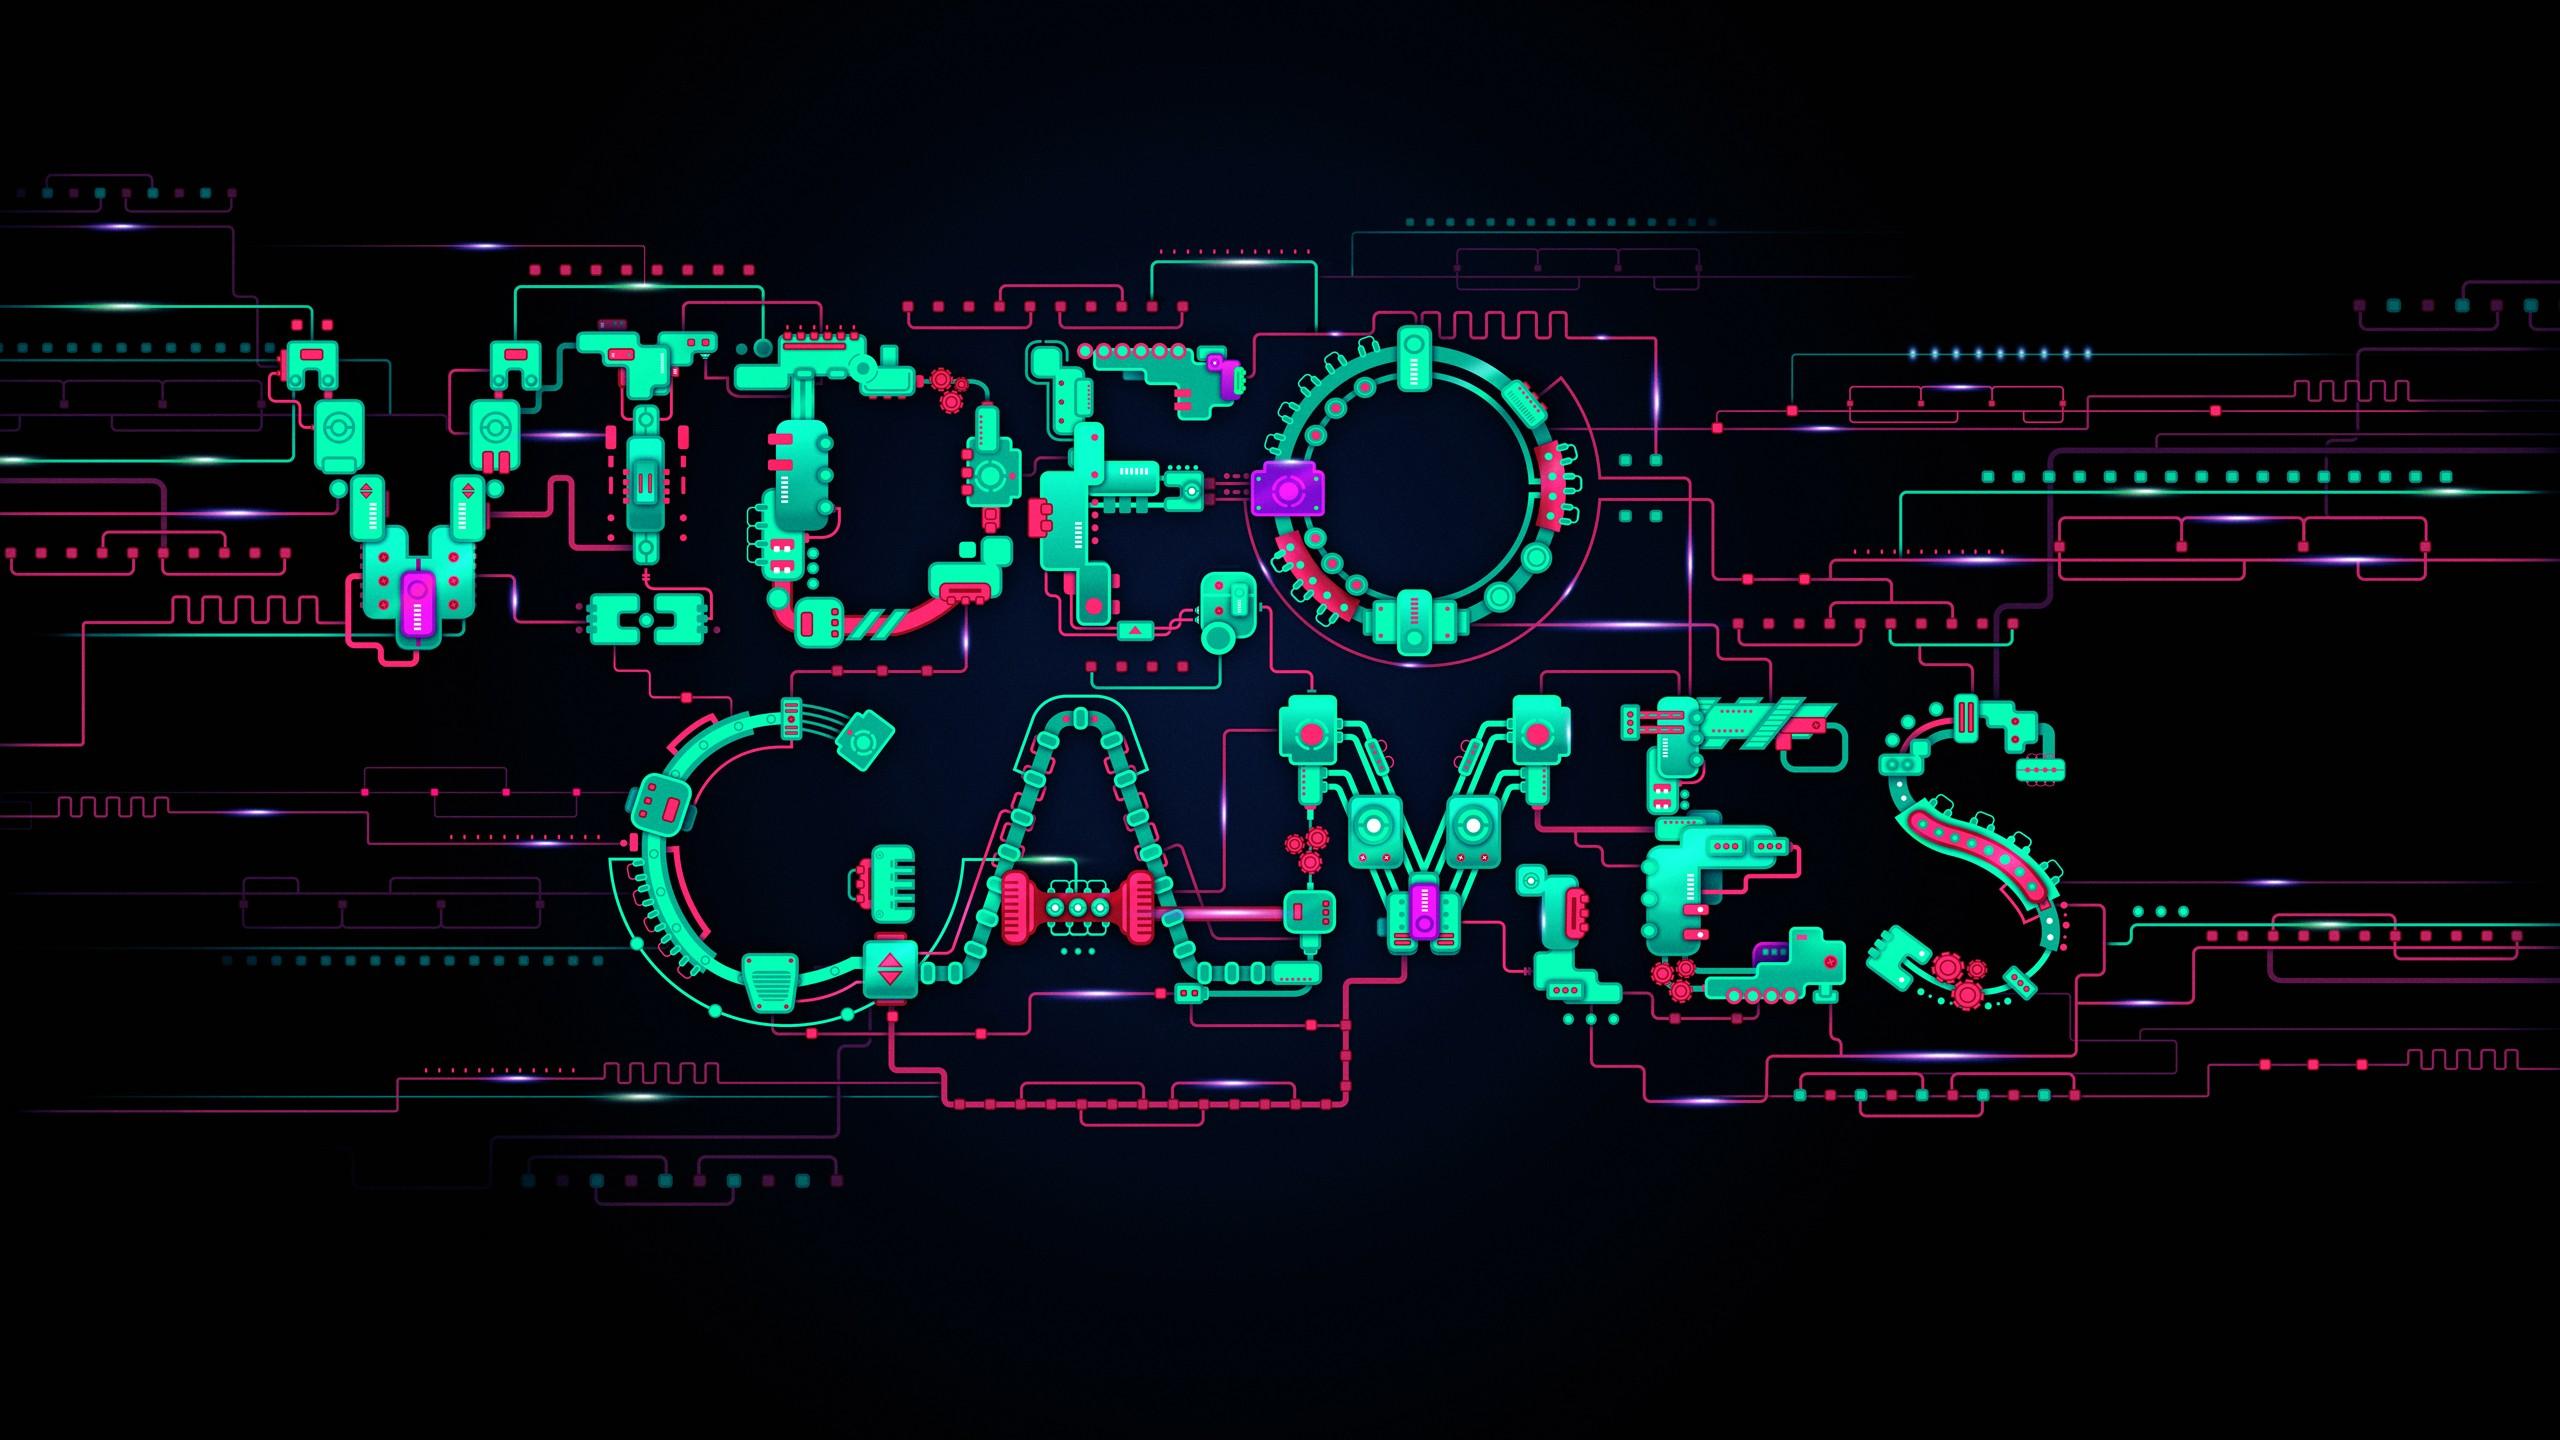 video games gamer wallpaper PC [ Wallpaper gamer pc ] 2560x1440